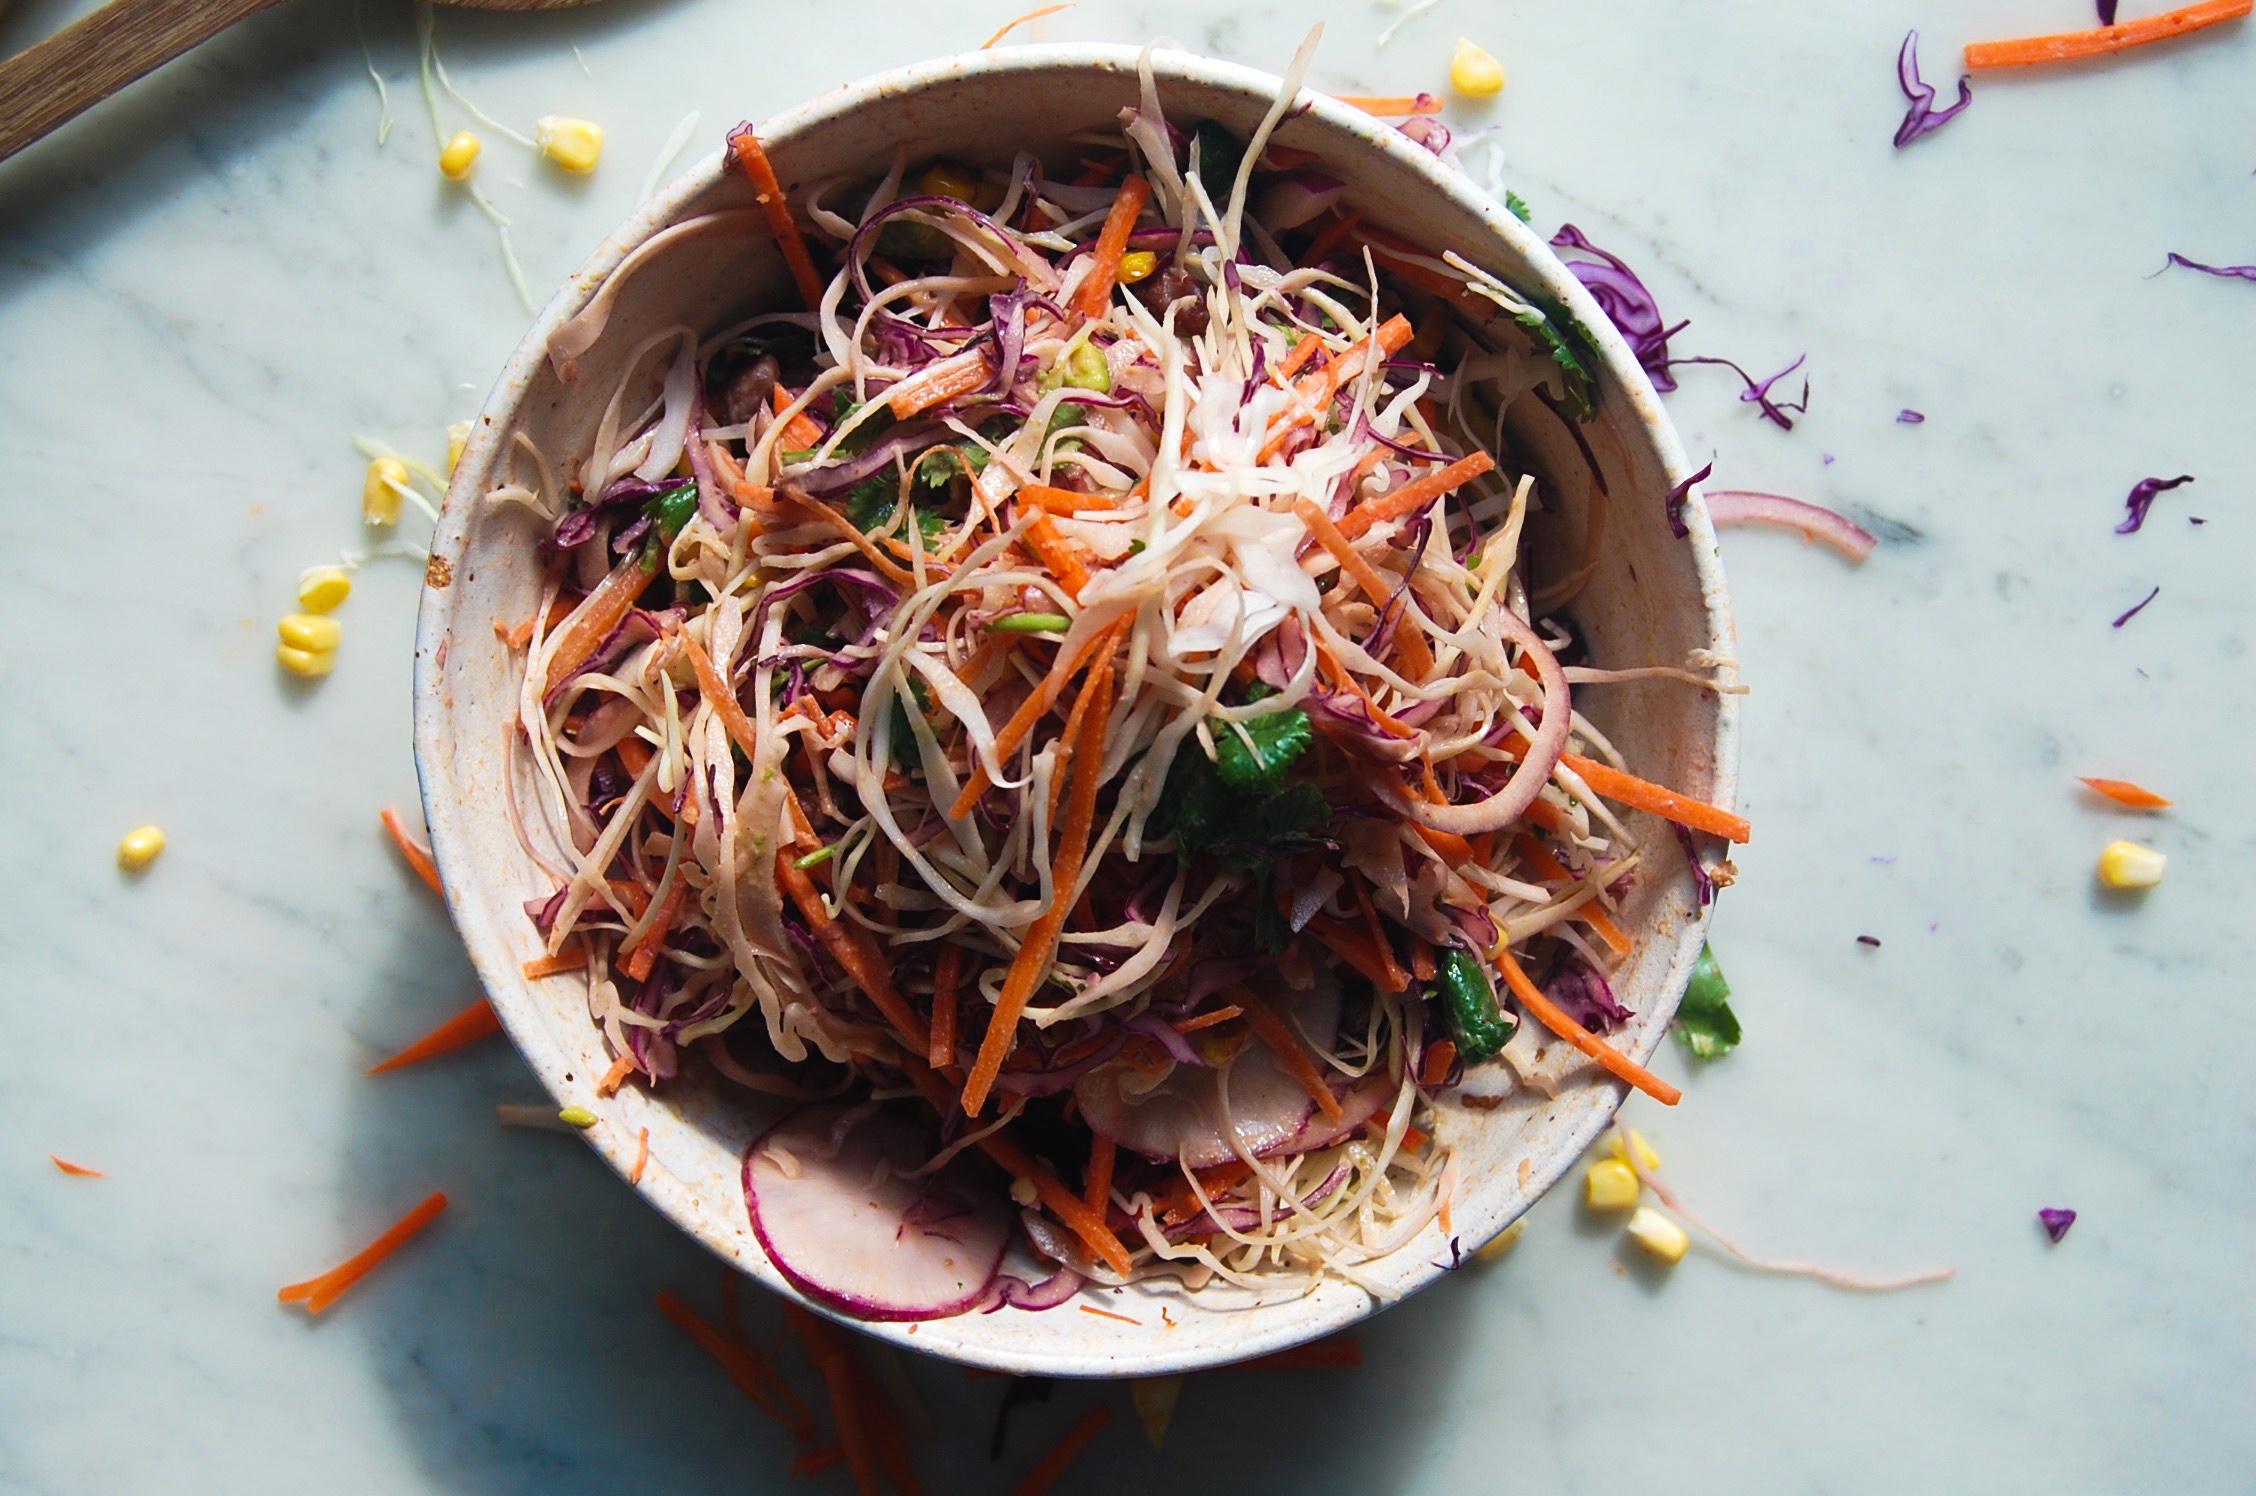 Chipotle Salad Dressing